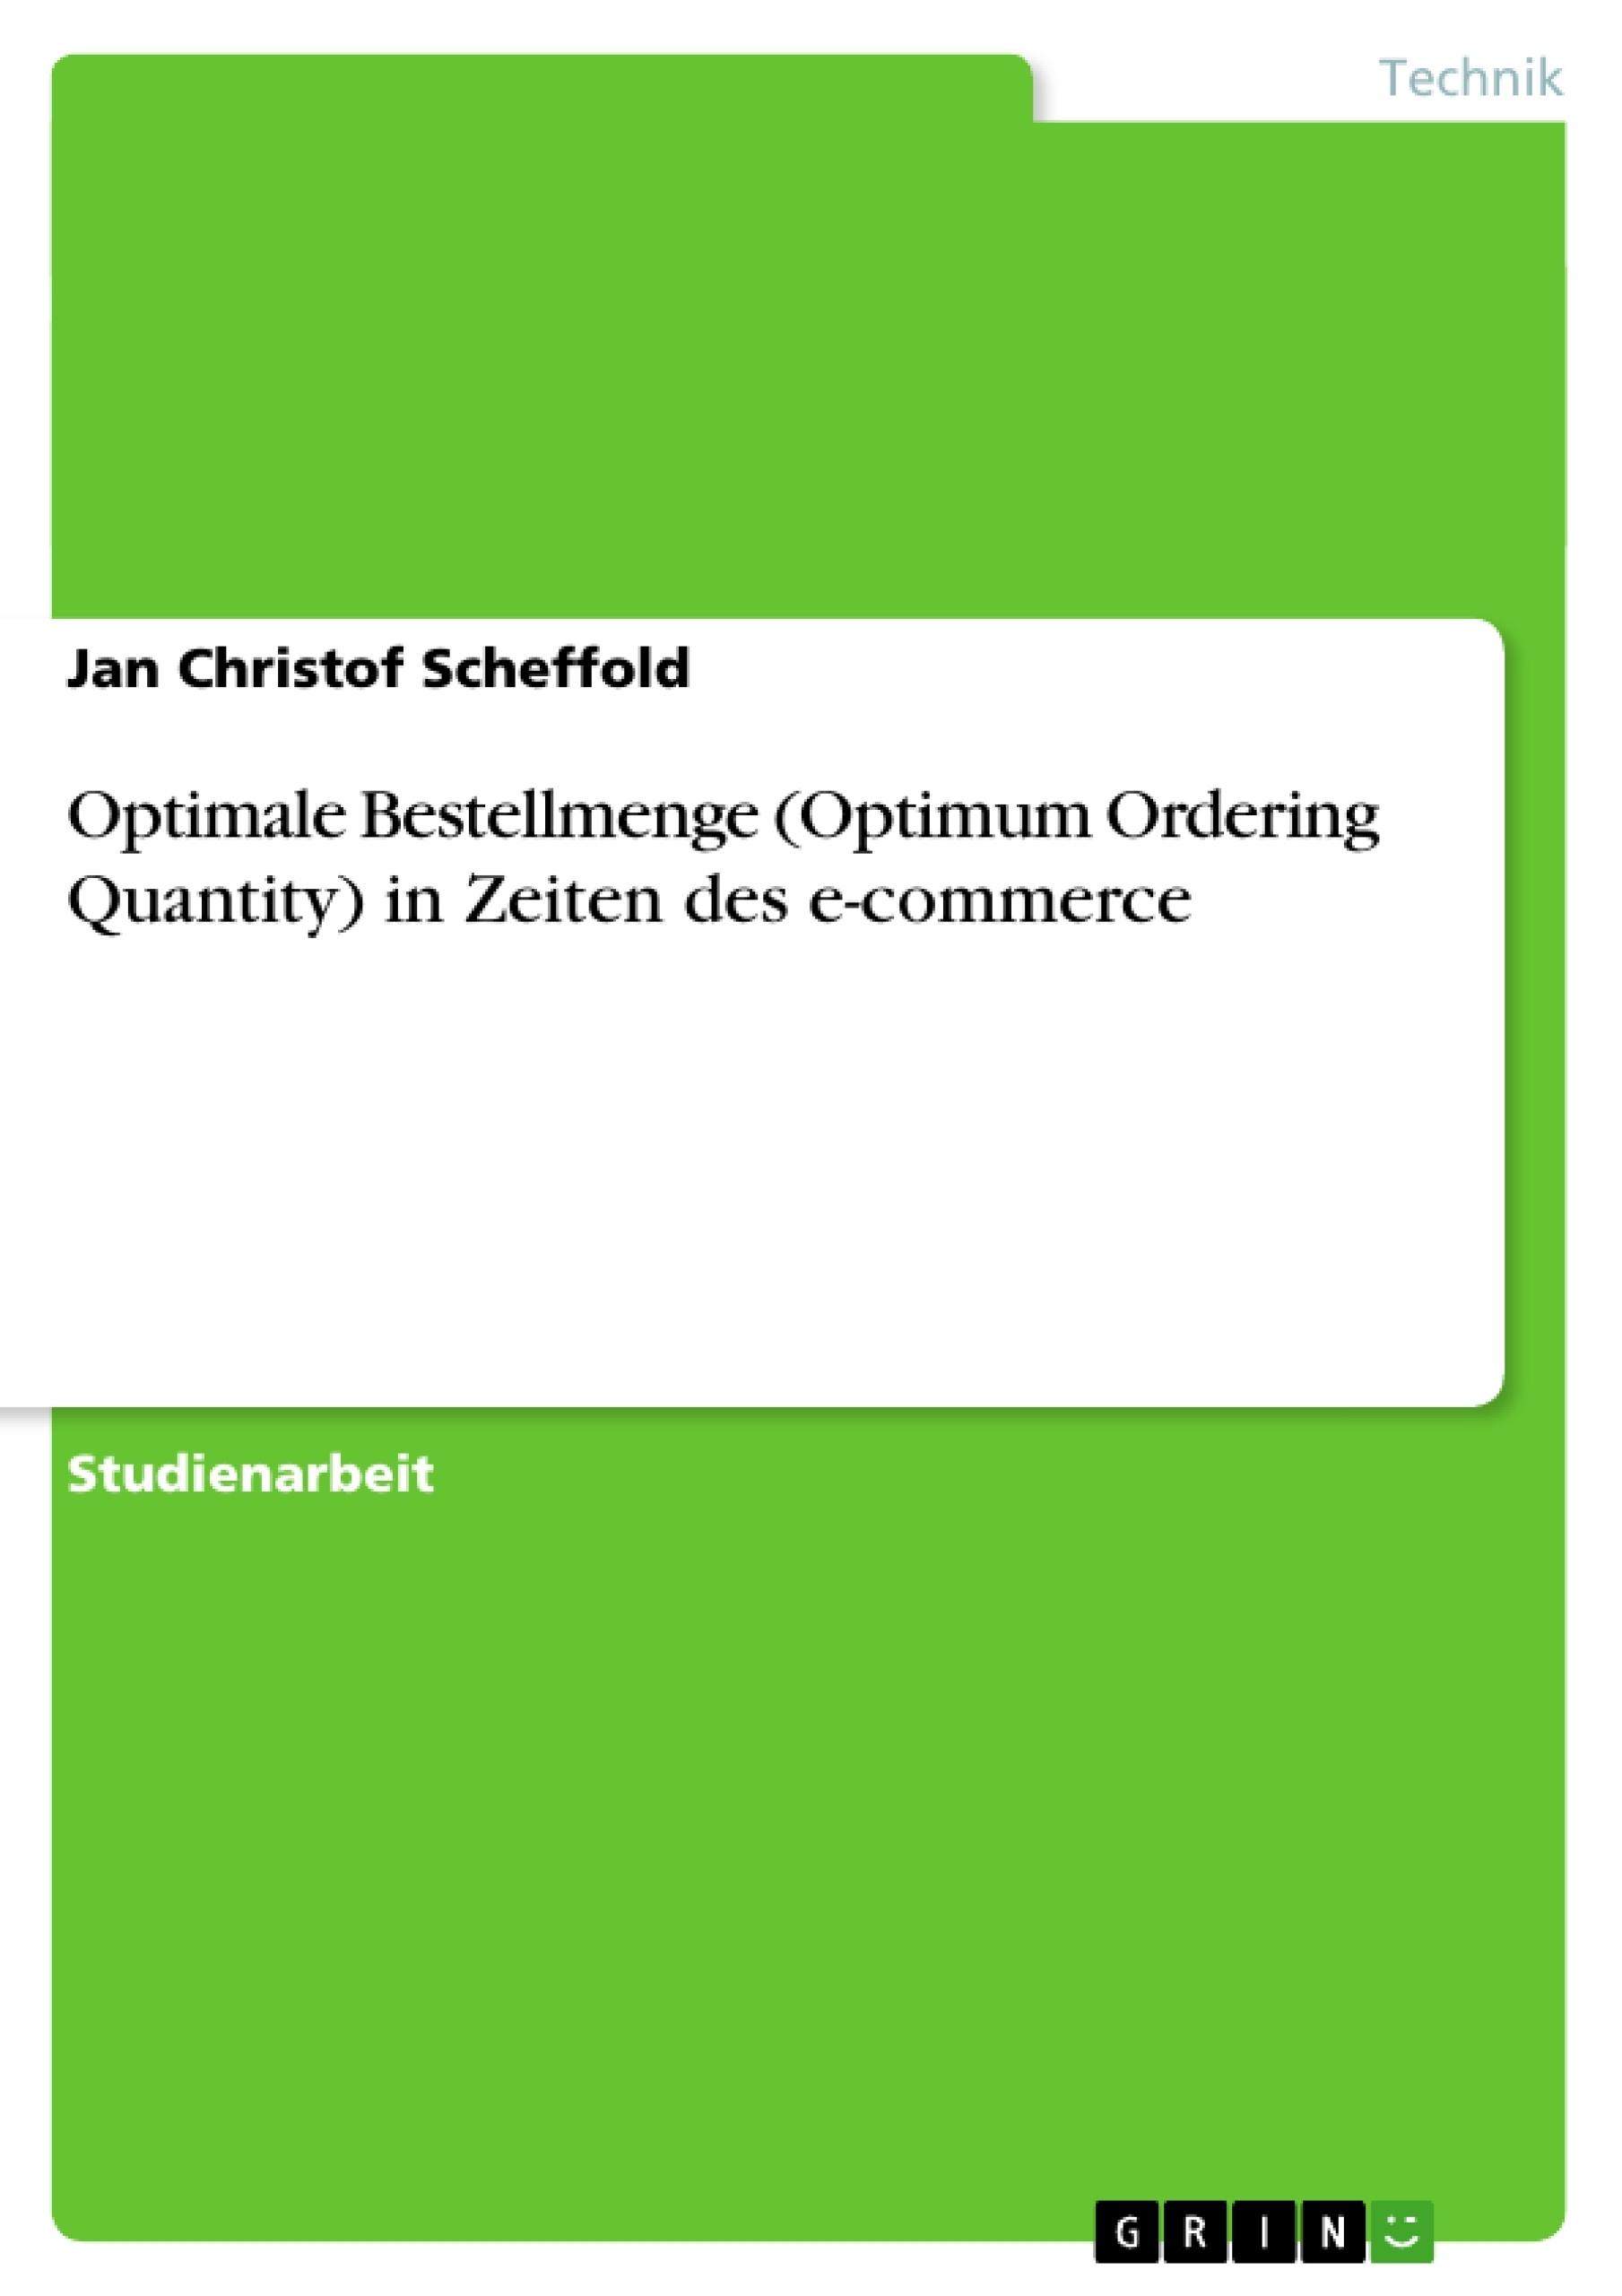 Titel: Optimale Bestellmenge (Optimum Ordering Quantity) in Zeiten des e-commerce